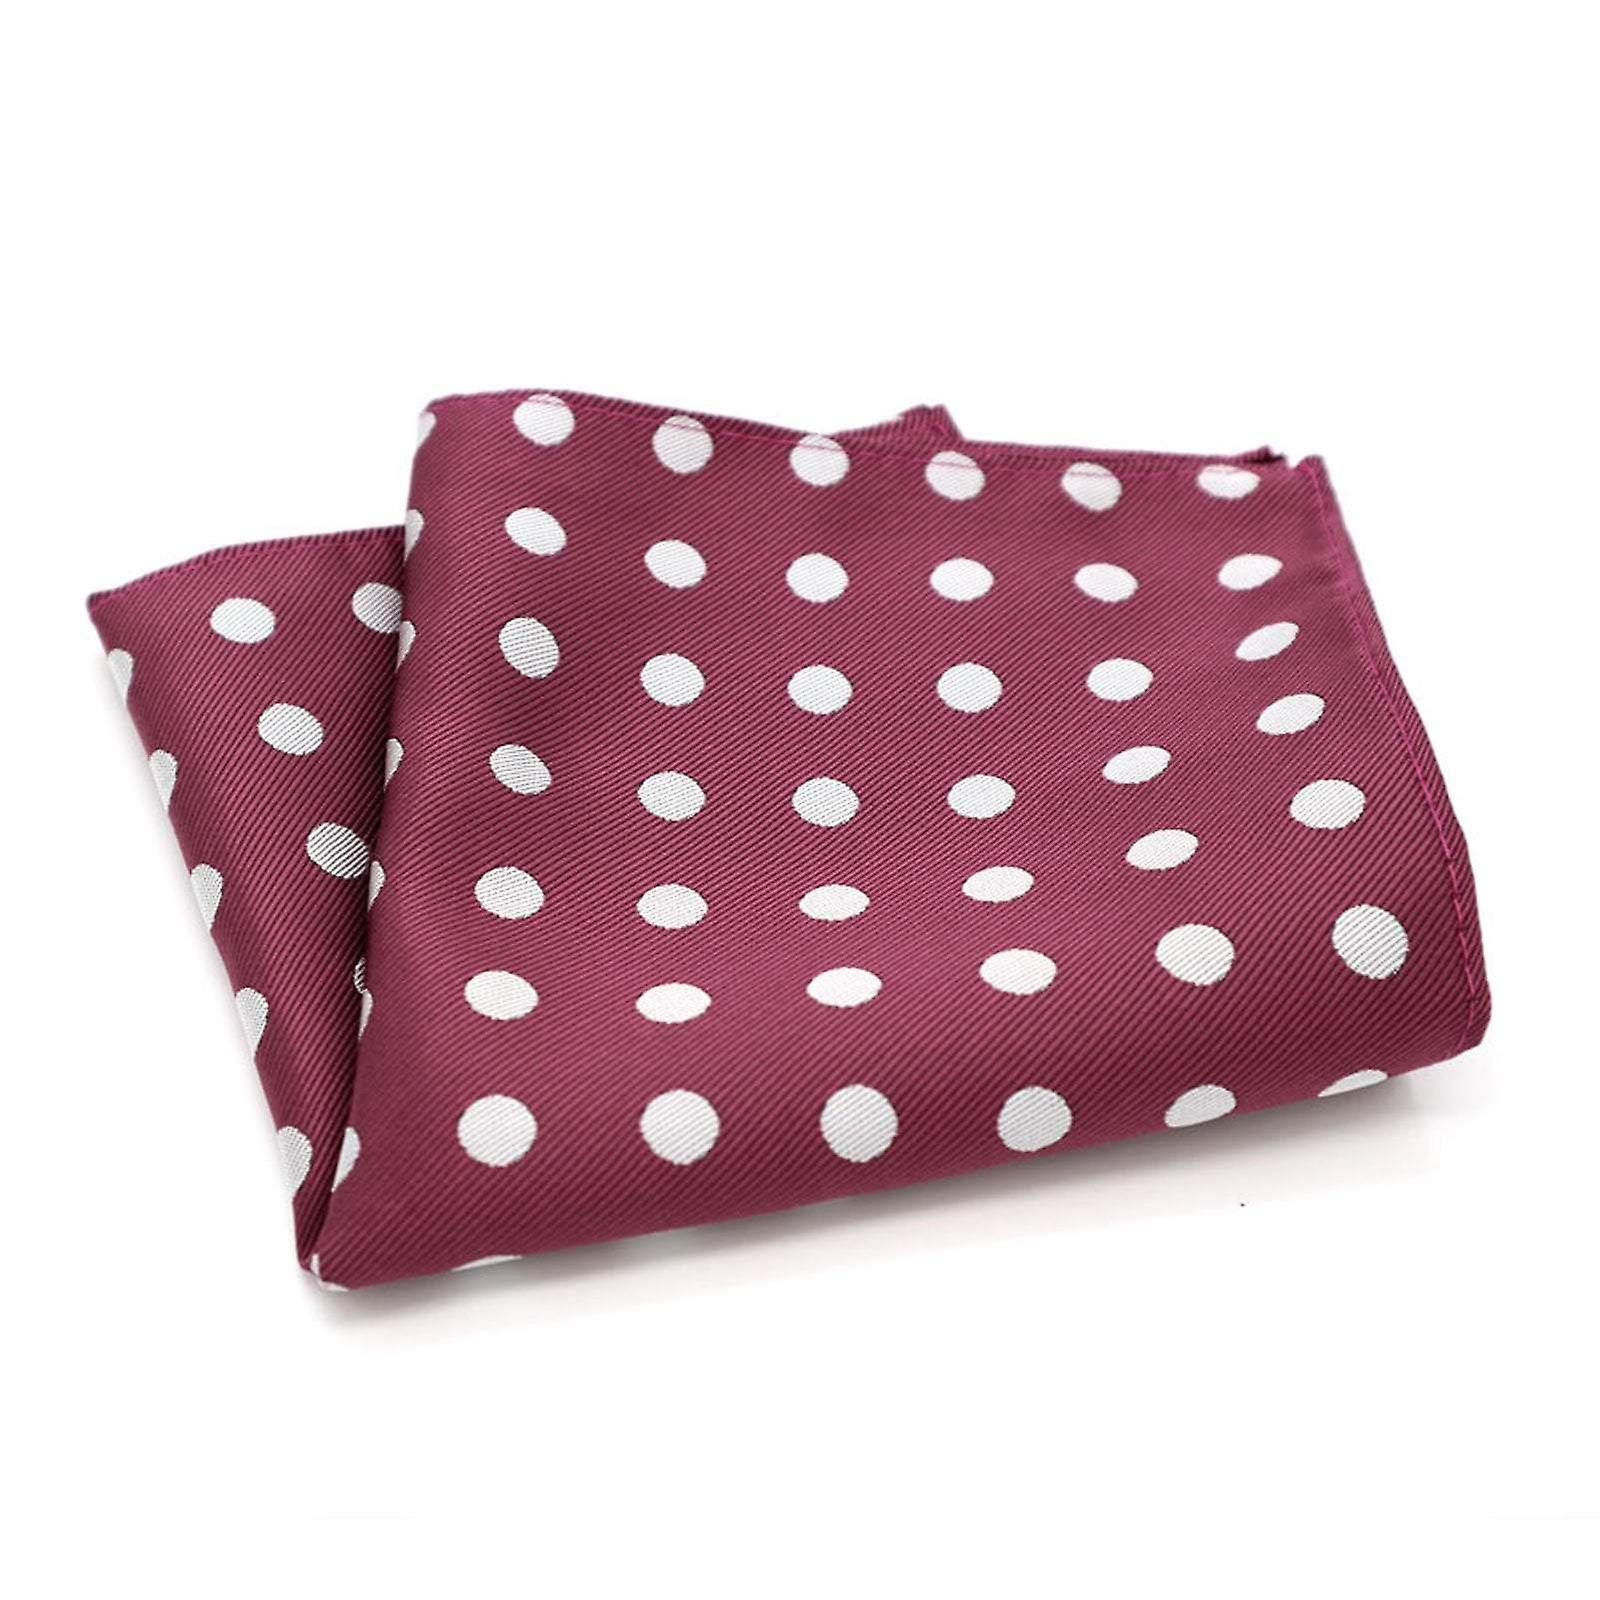 Dark red & white polka dot spot pattern pocket square